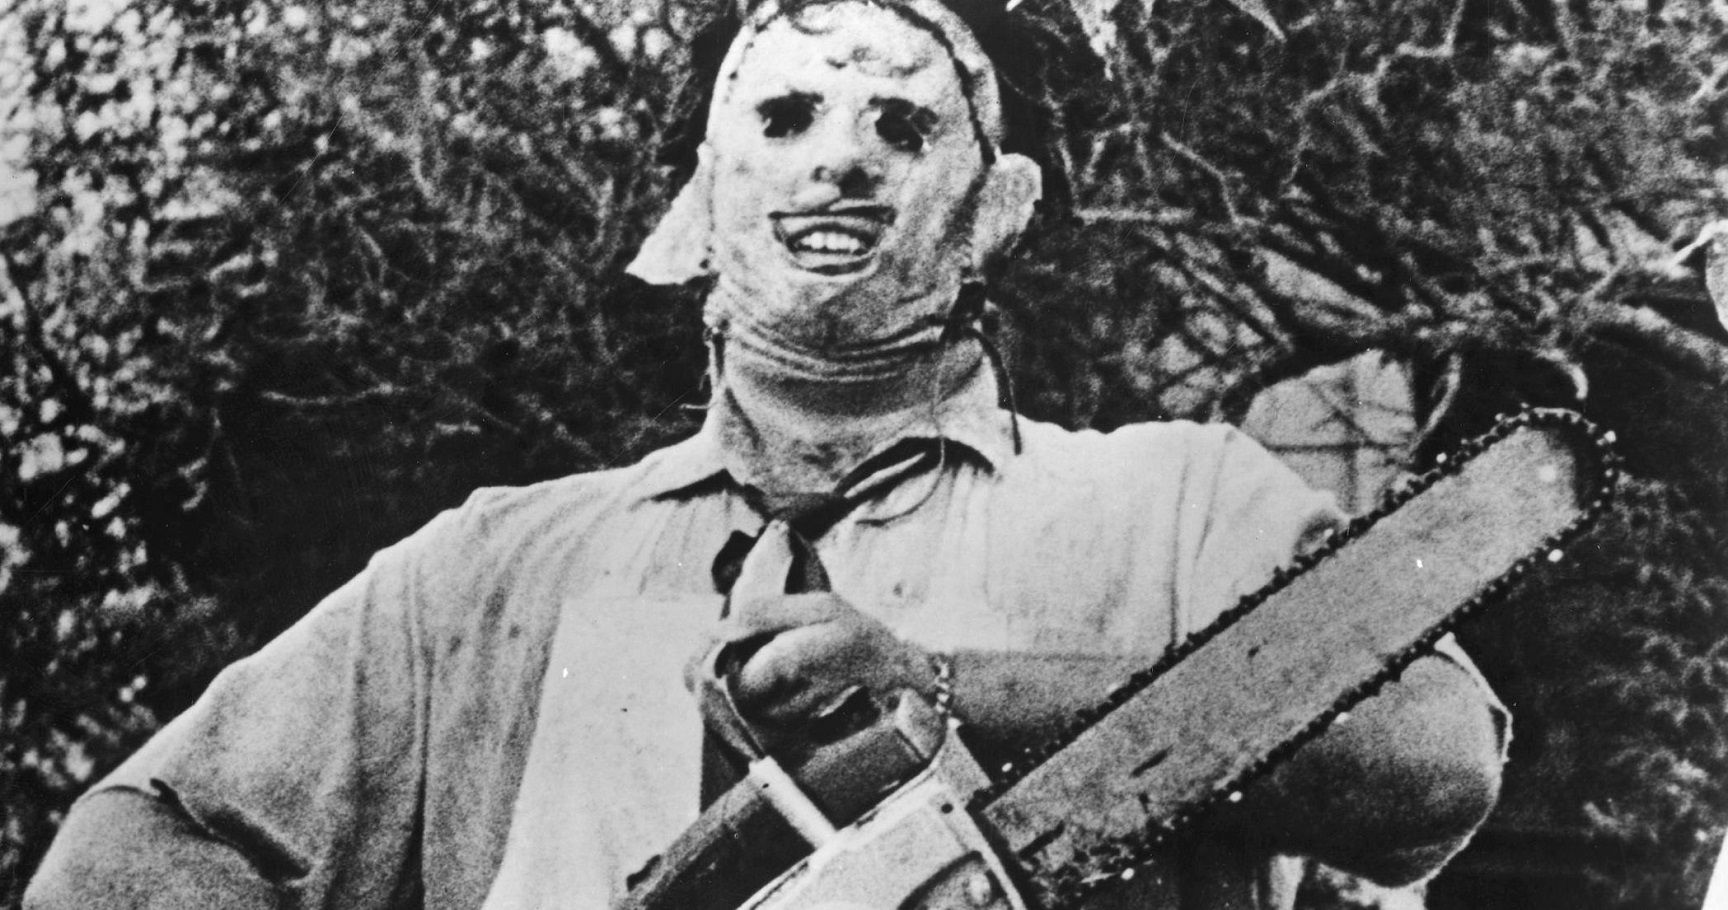 The 10 Most Disturbing Murder Cases in Modern History